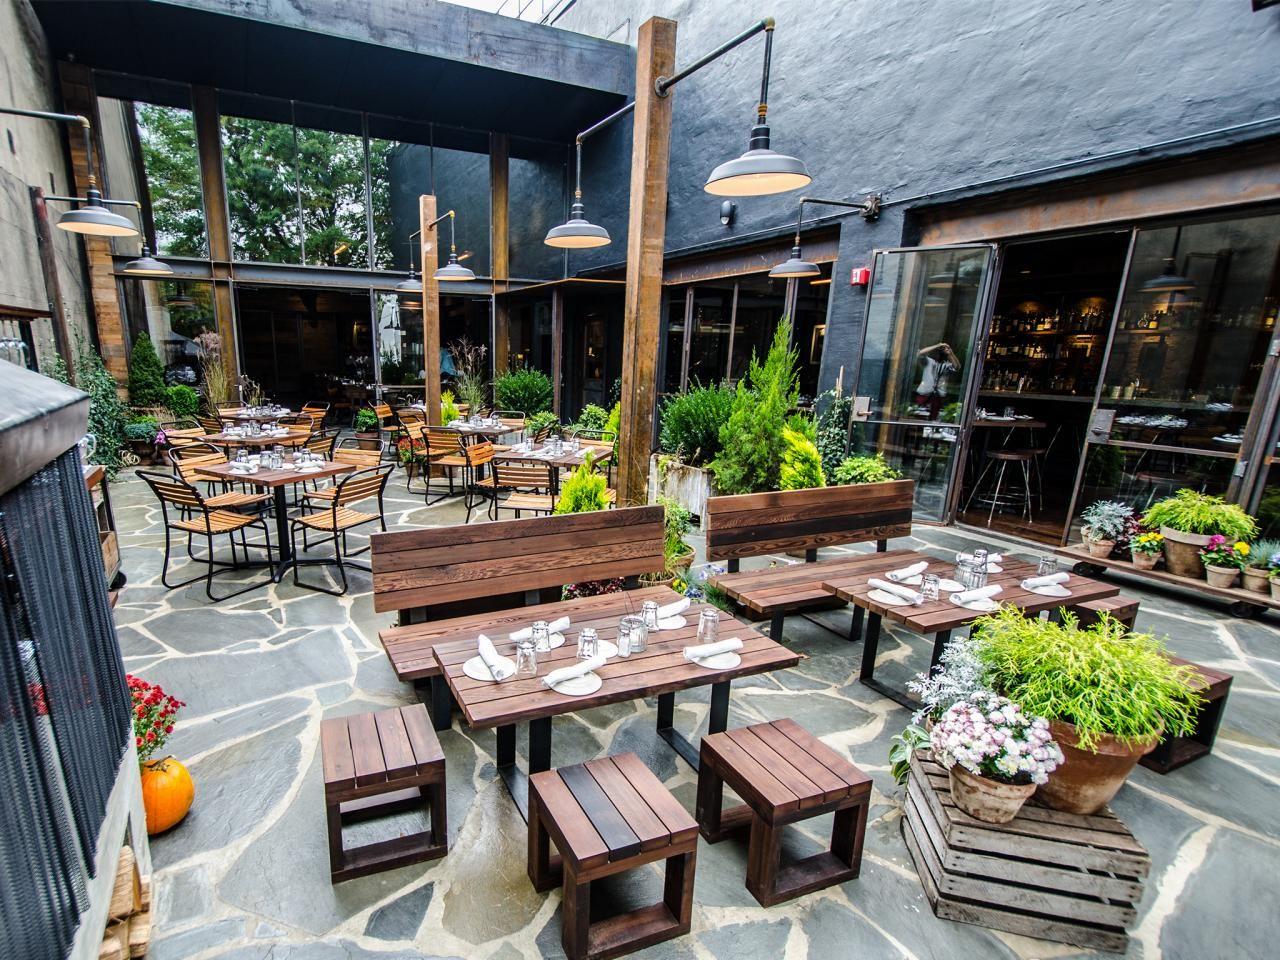 Dcs hip neighborhood restaurants and bars washington